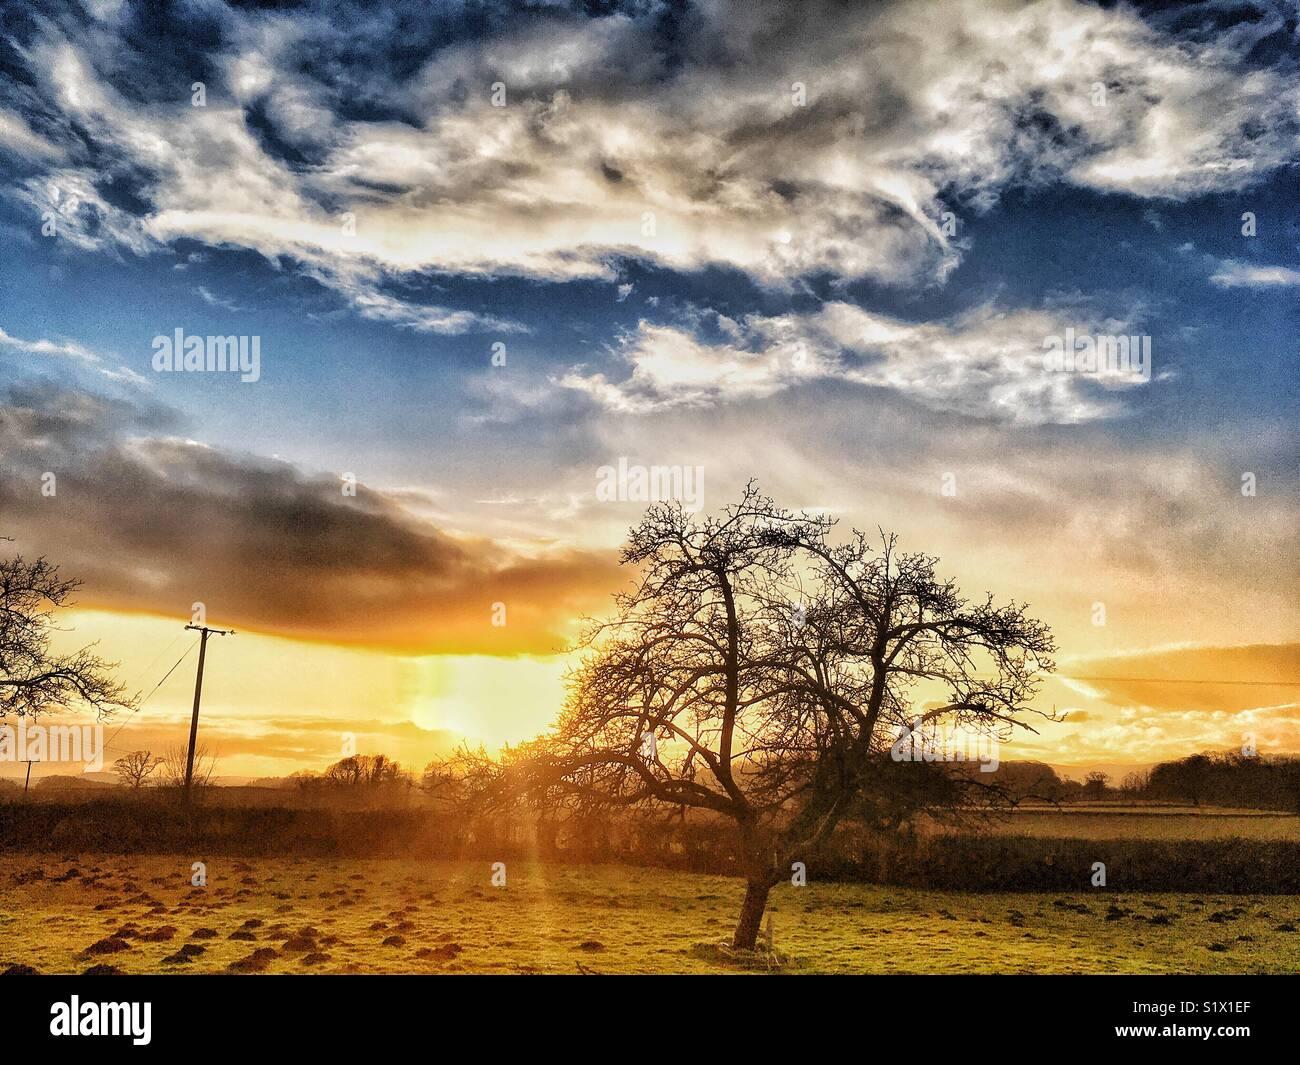 Sol de inverno Imagens de Stock